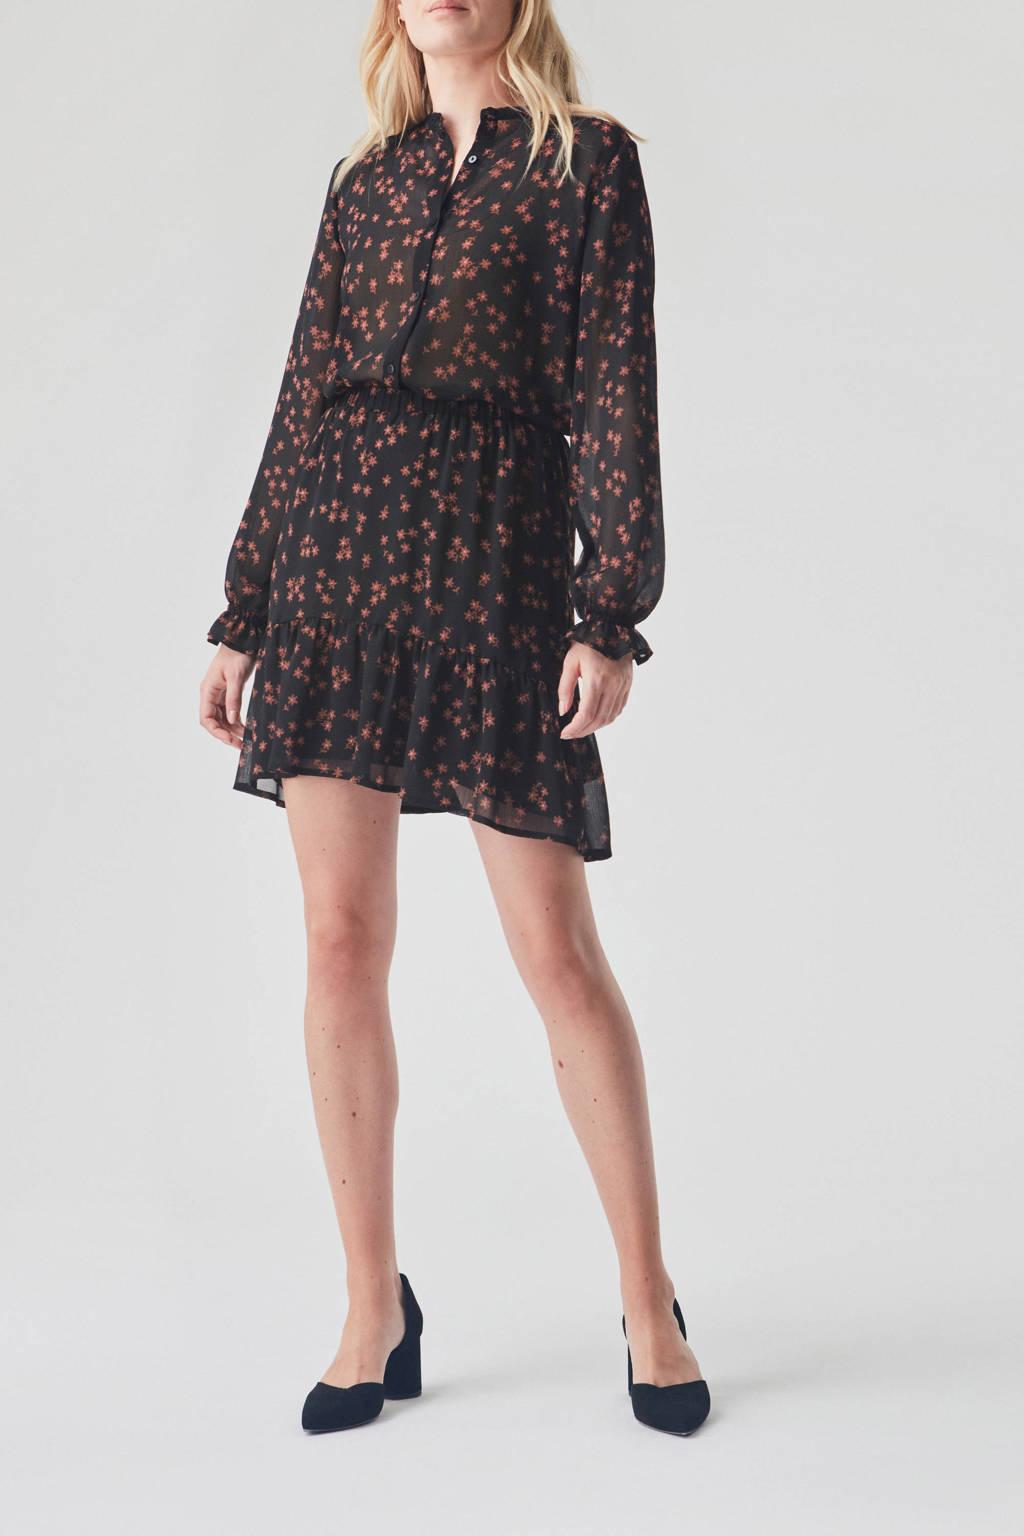 Modström gebloemde semi-transparante blouse Erica van gerecycled polyester zwart/ bruin